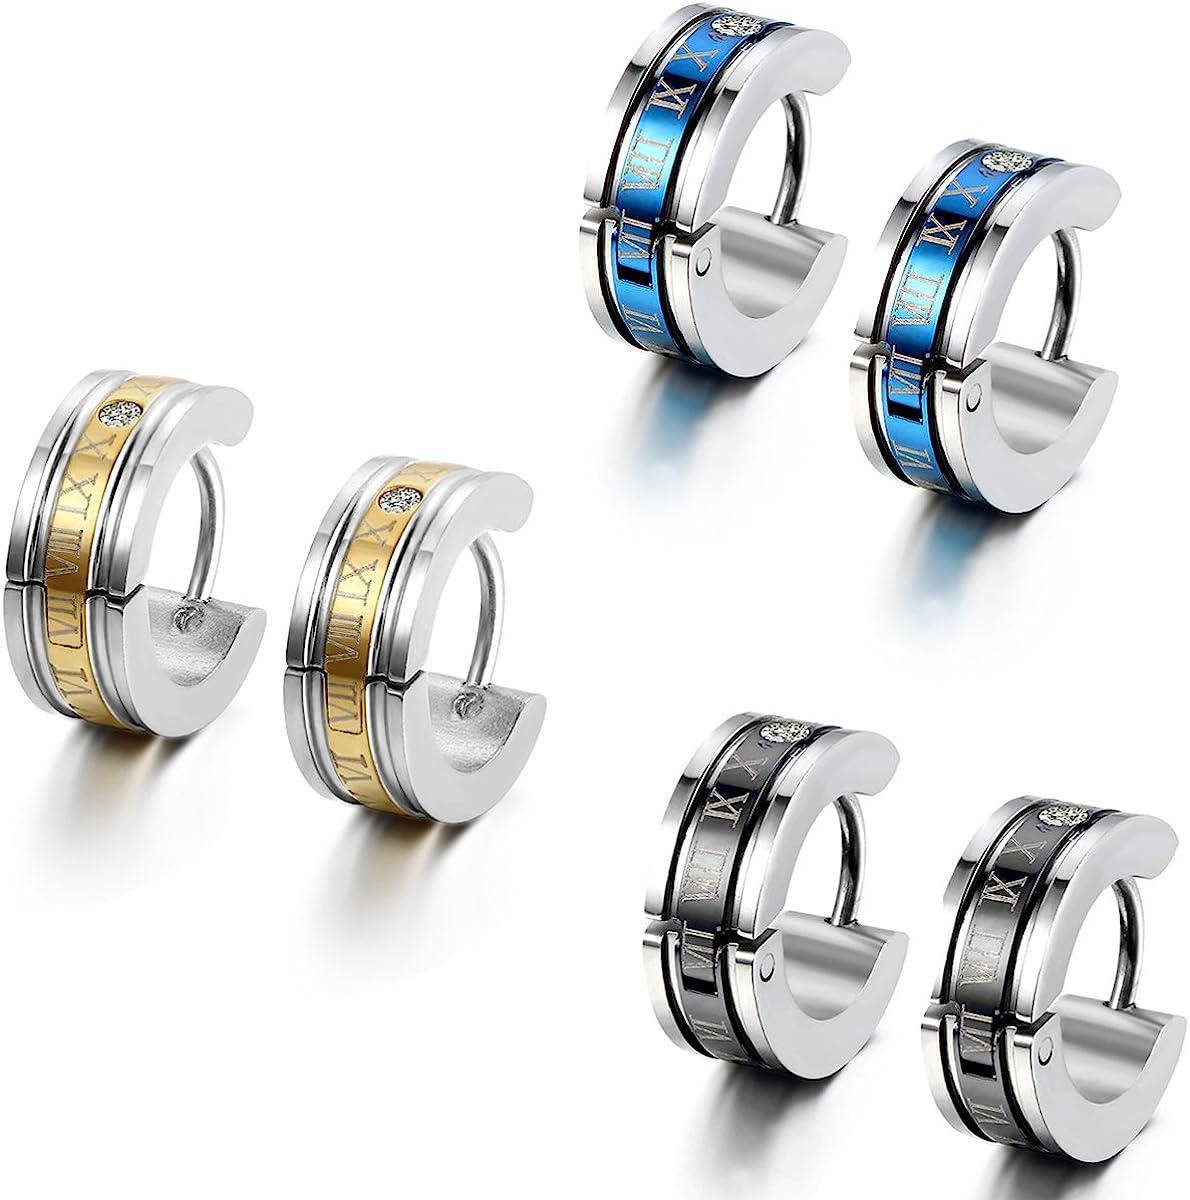 Flongo Men's Celtic Biker Stainless Steel Engraved Roman Numerals Polished Hoop Hinged Earrings, Classic Ear Plugs Huggie Earrings for Men Women